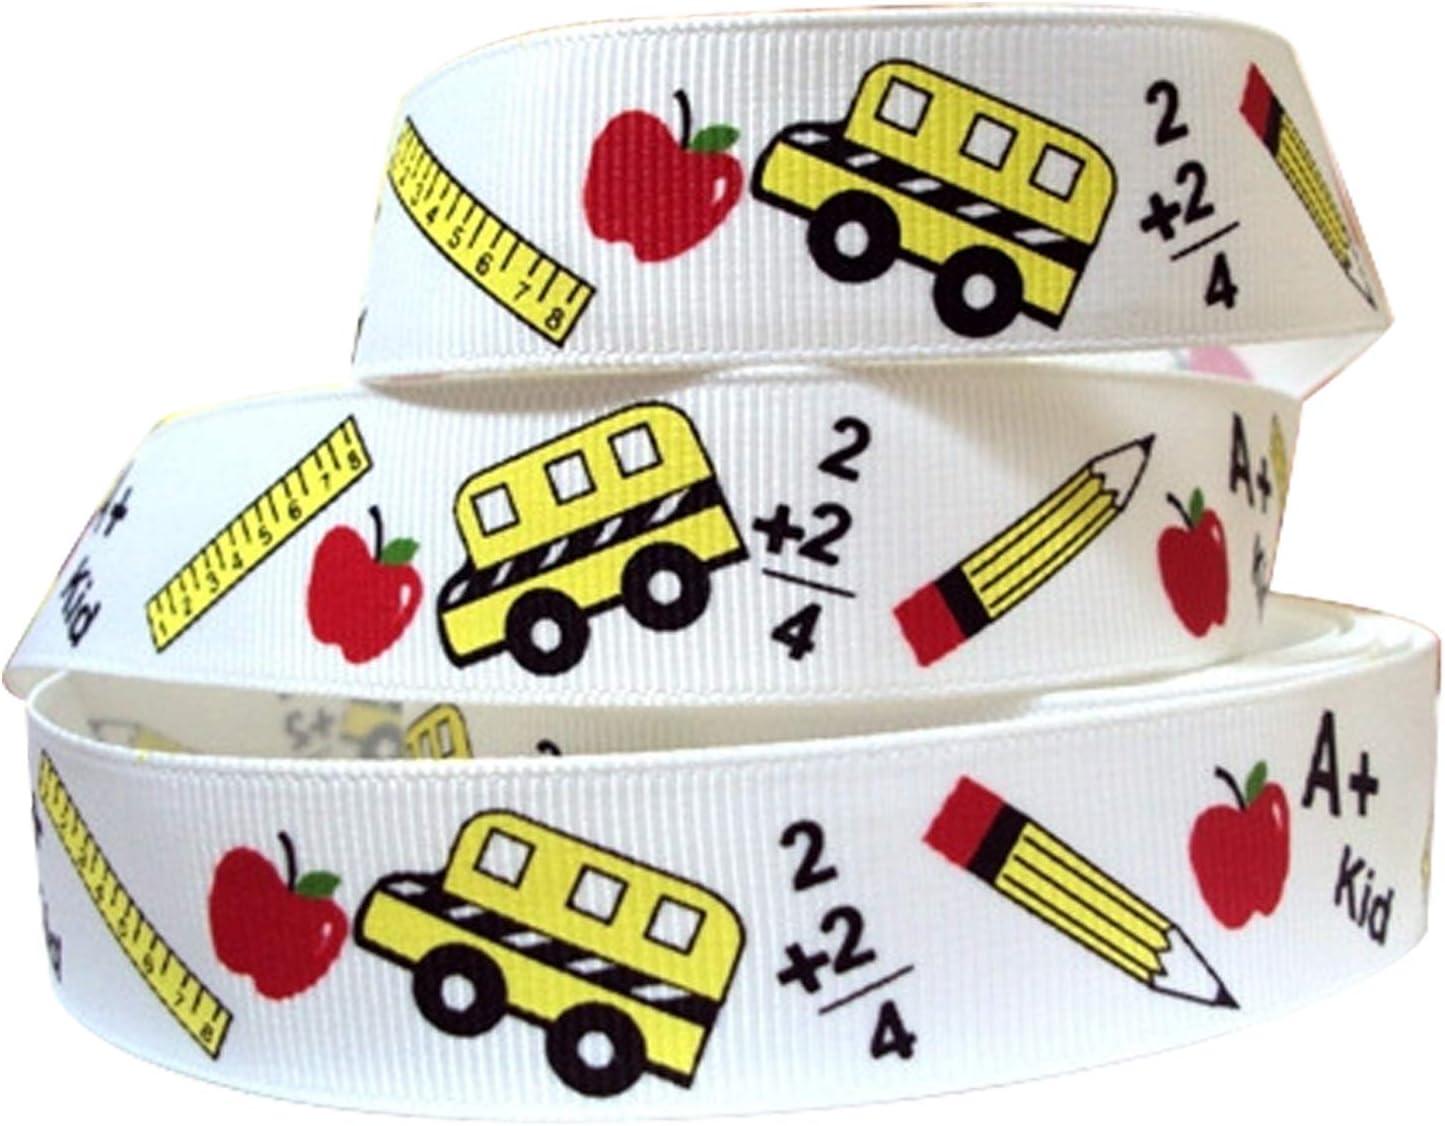 Back to School Ribbon for Crafts - 10 Yard | School Themed Ribbon Decor | Decorations for Teacher Appreciation Gift | School Grosgrain Ribbon | ABC Ribbon for Back to School Decorations Supplies